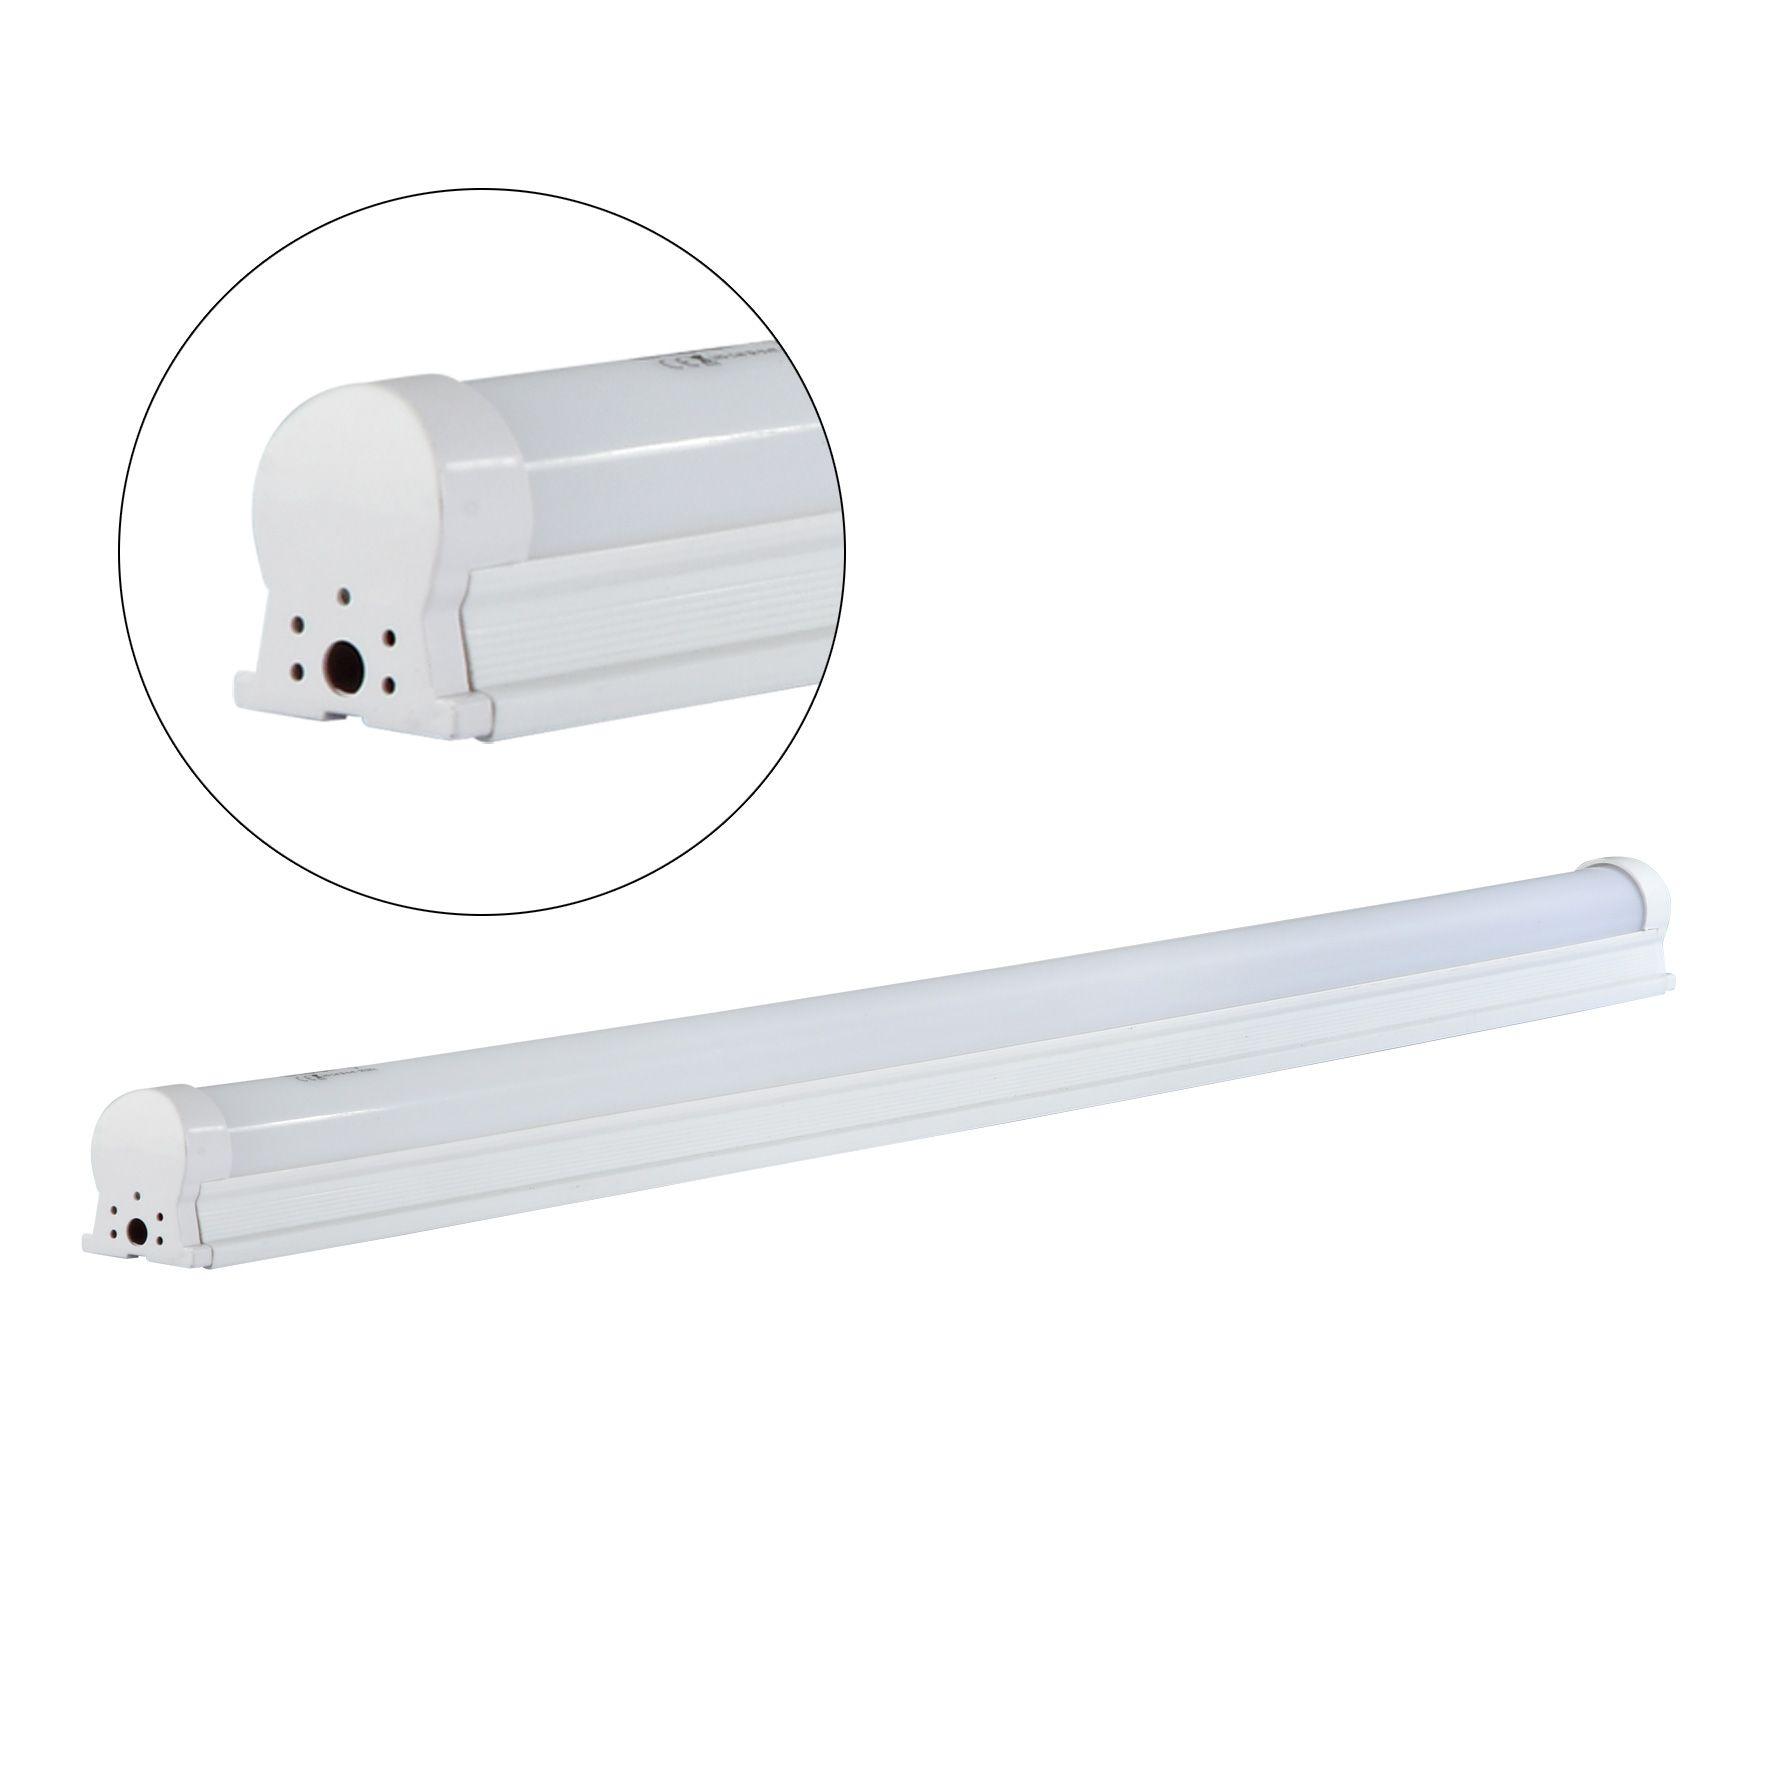 kit 20 Lâmpadas LED Tubular C/Calha T8L 9W 60CM/6500K Bi-Volt EQQO Branca (800 Lumens)